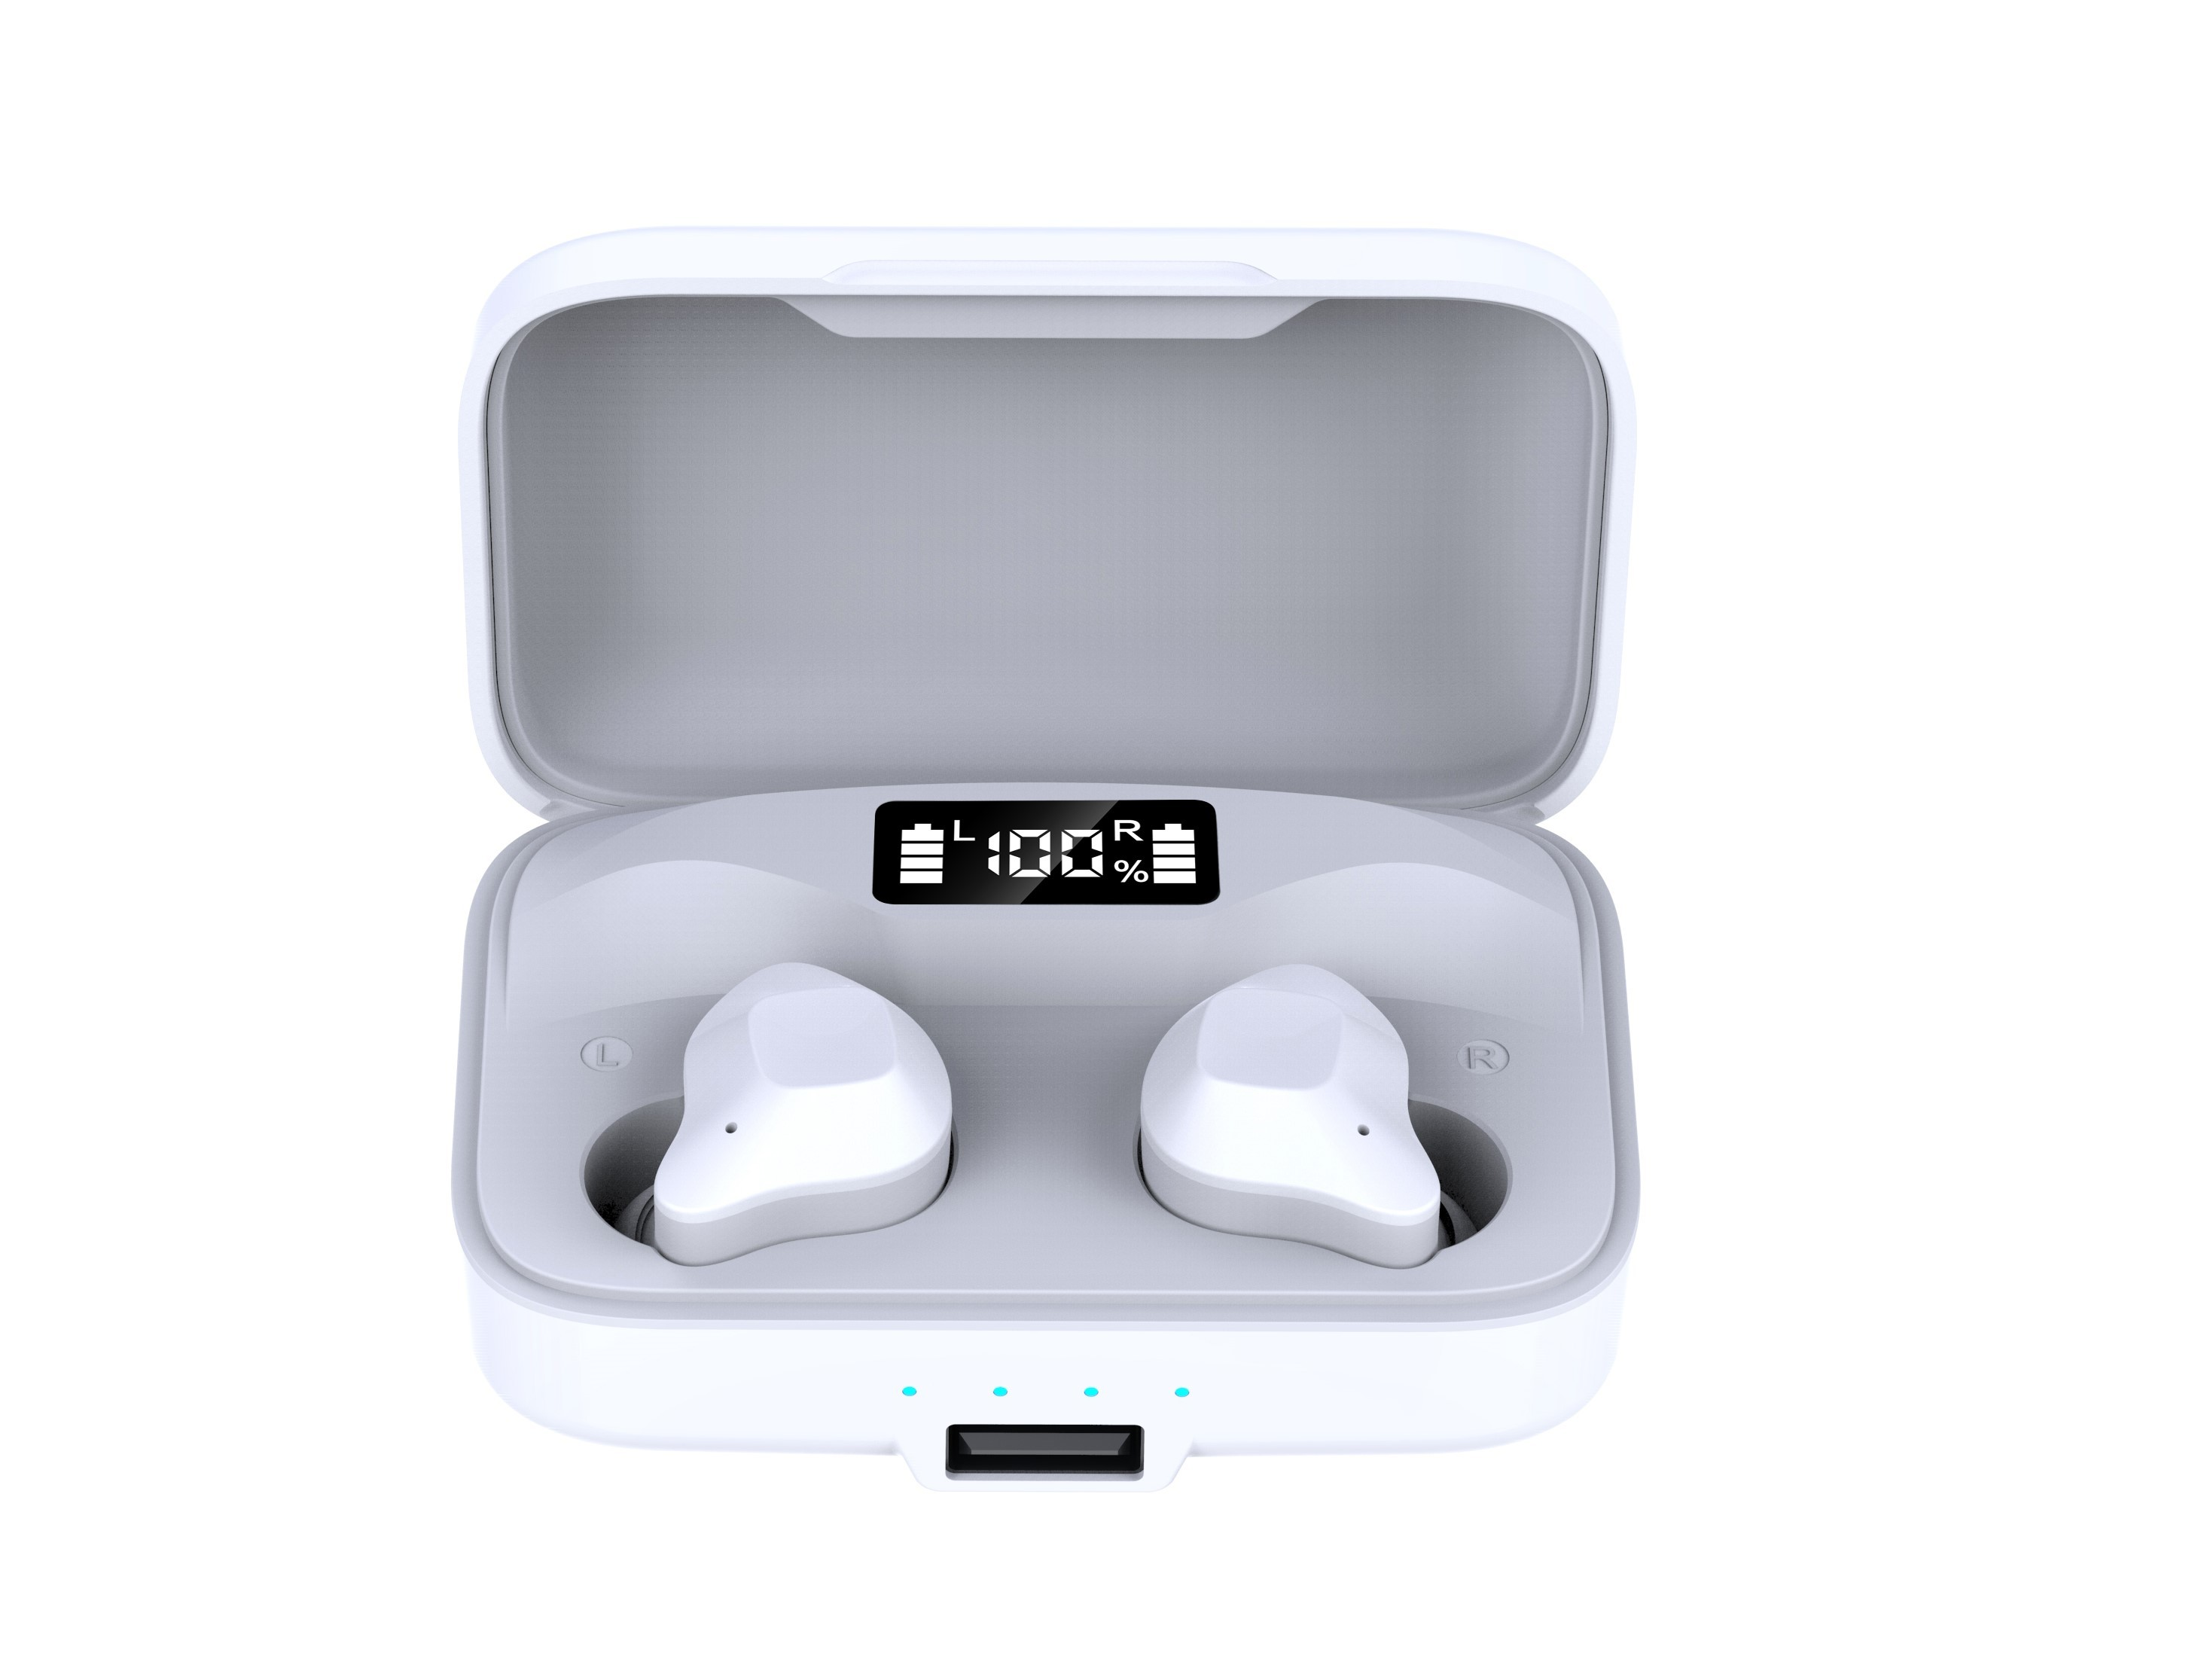 Casti Smart Techstar® TWS S15S, Wireless, Bluetooth V5.0, HD Audio, Touch, iOS, Android, Type-C, 1500mAh, Alb